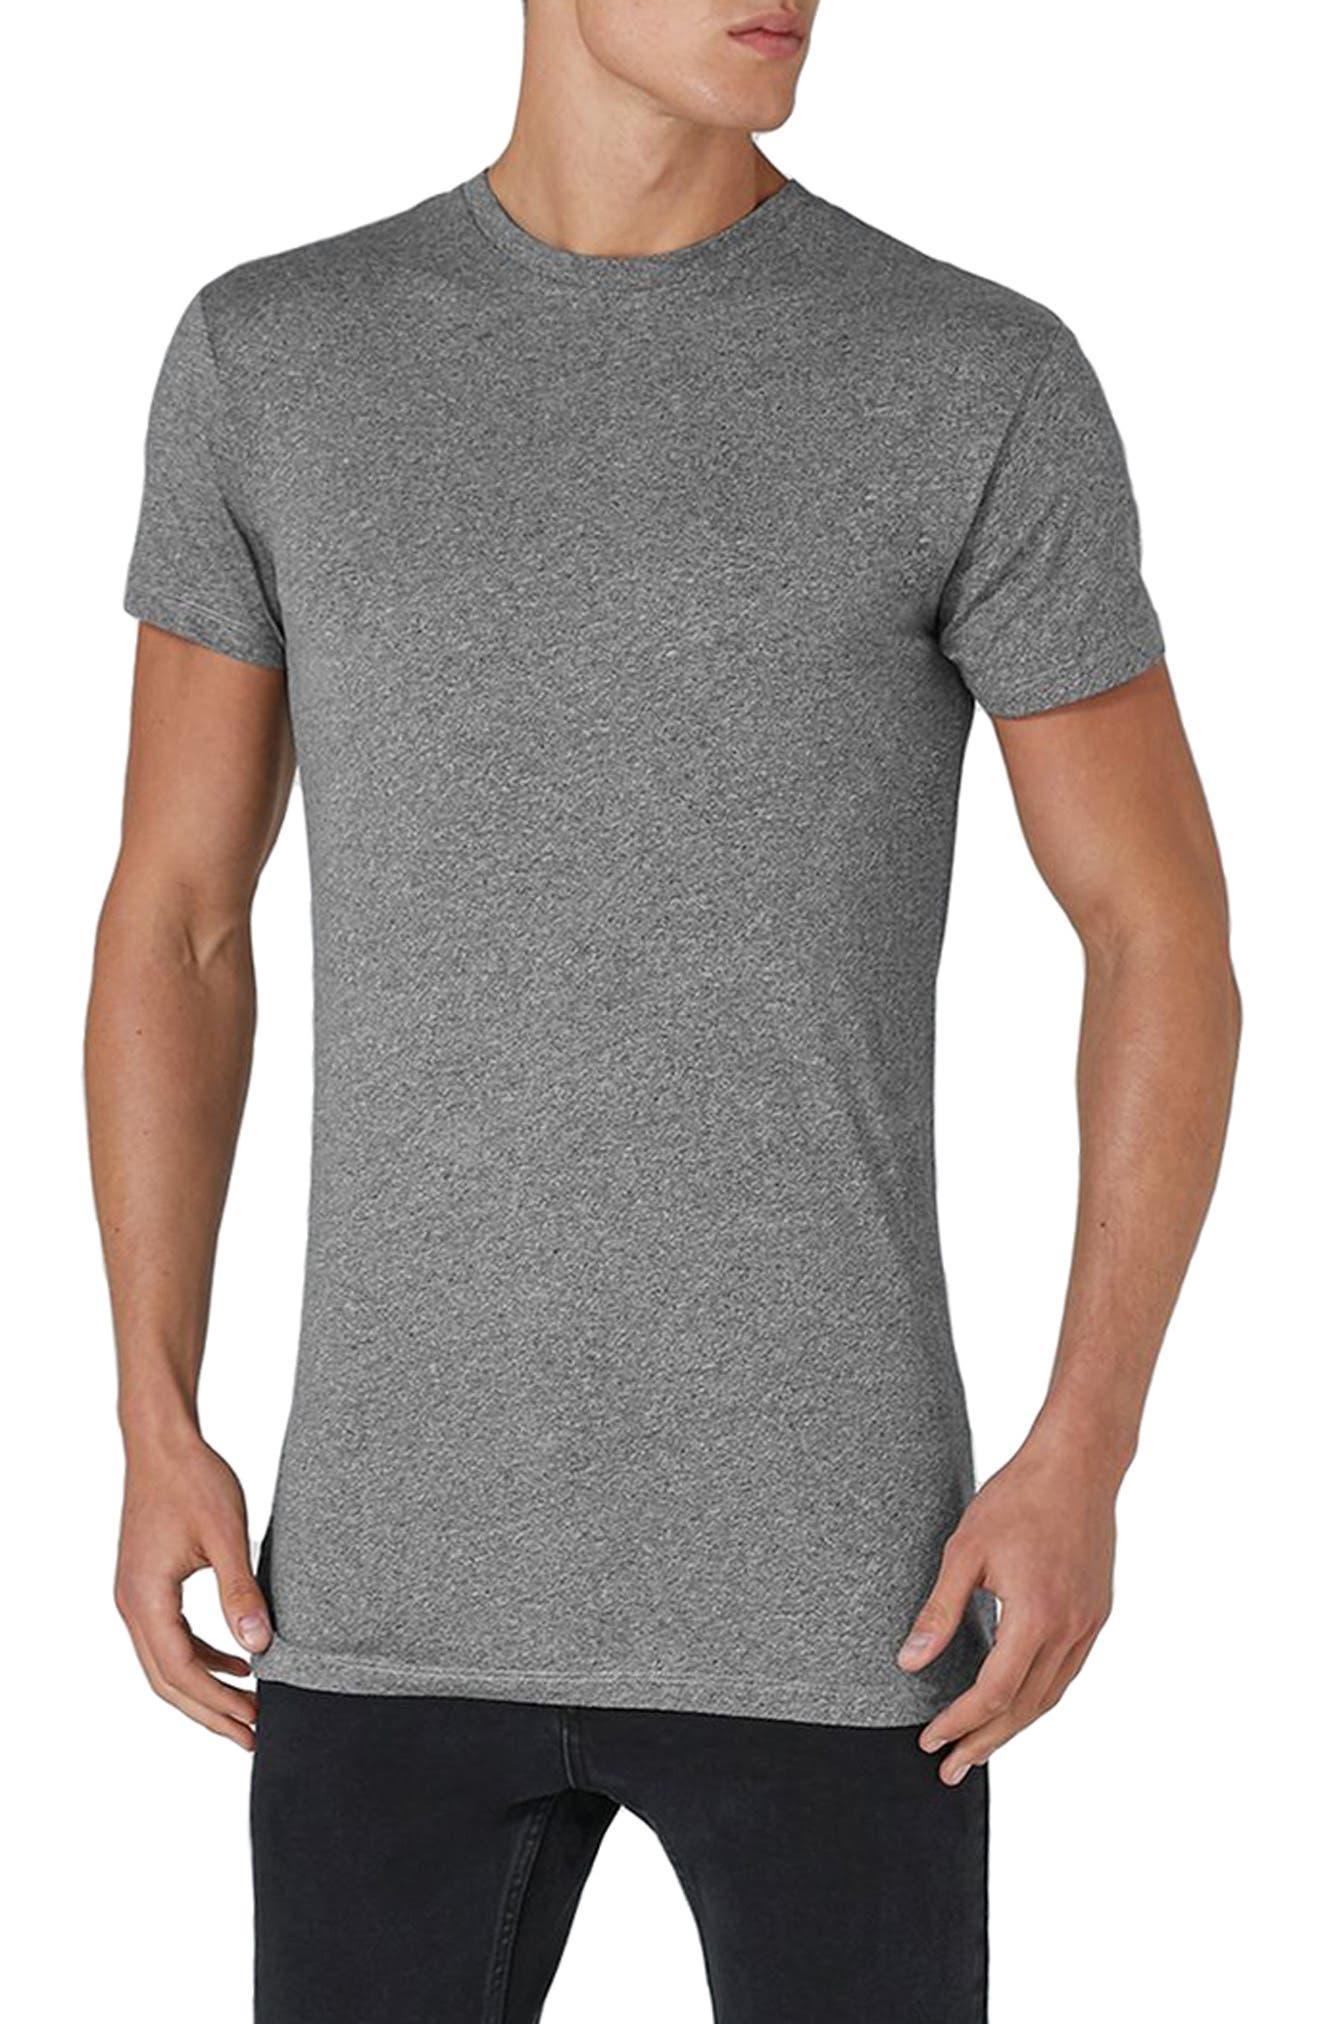 Muscle Fit Longline T-Shirt,                             Main thumbnail 1, color,                             Grey